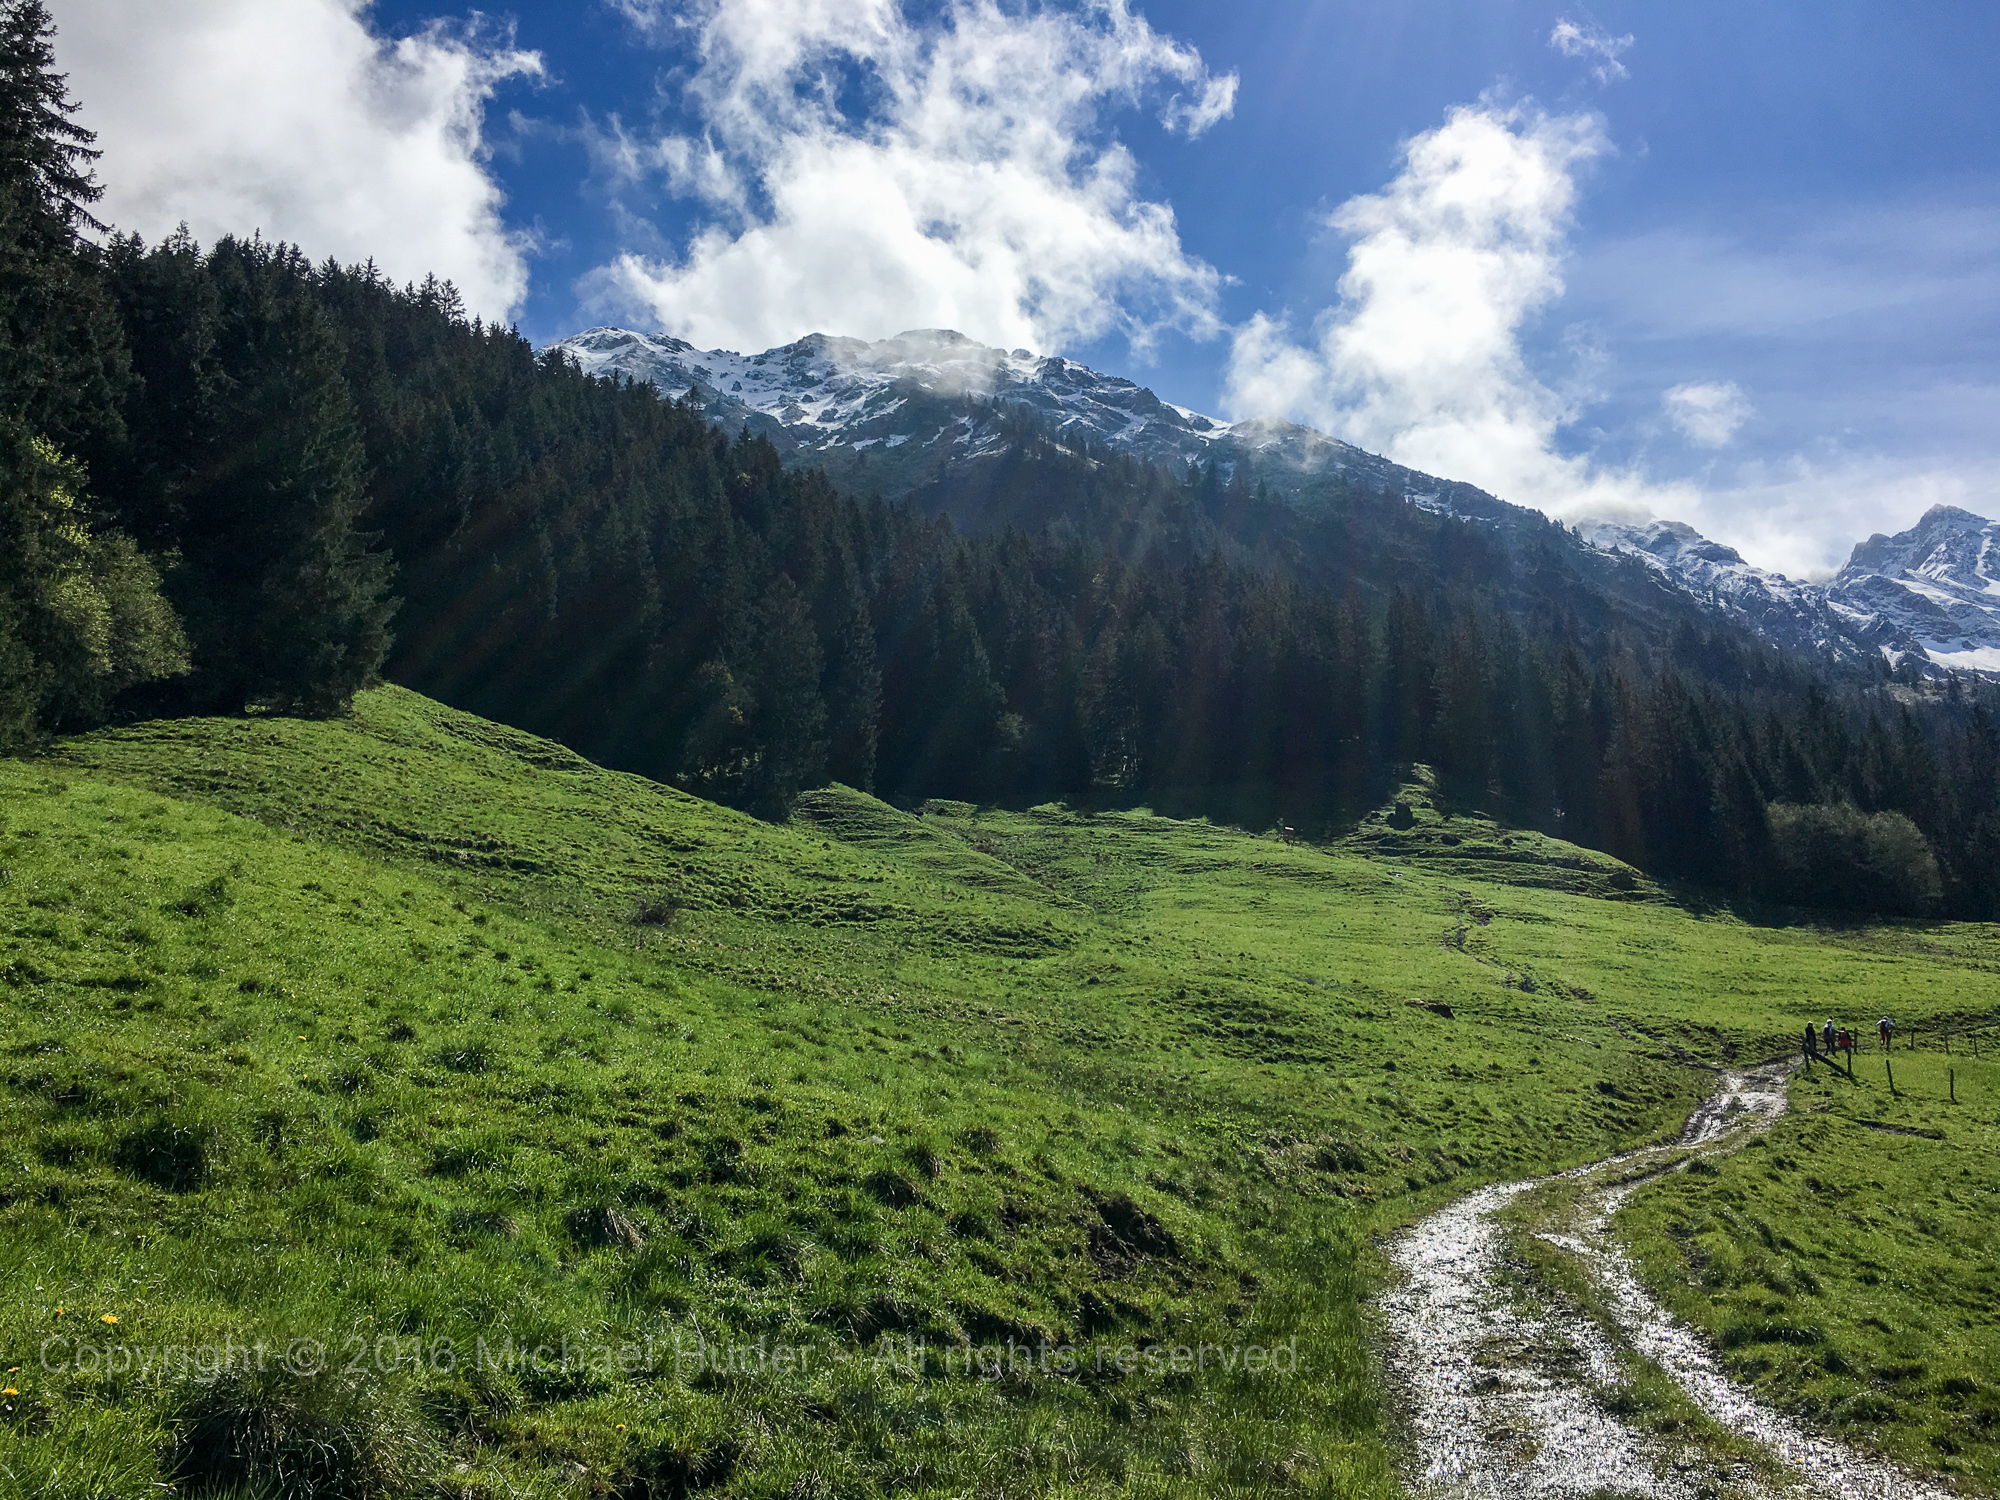 20.05.2016, Oberstdorf Wanderung zum Unteren Gaisalpsee